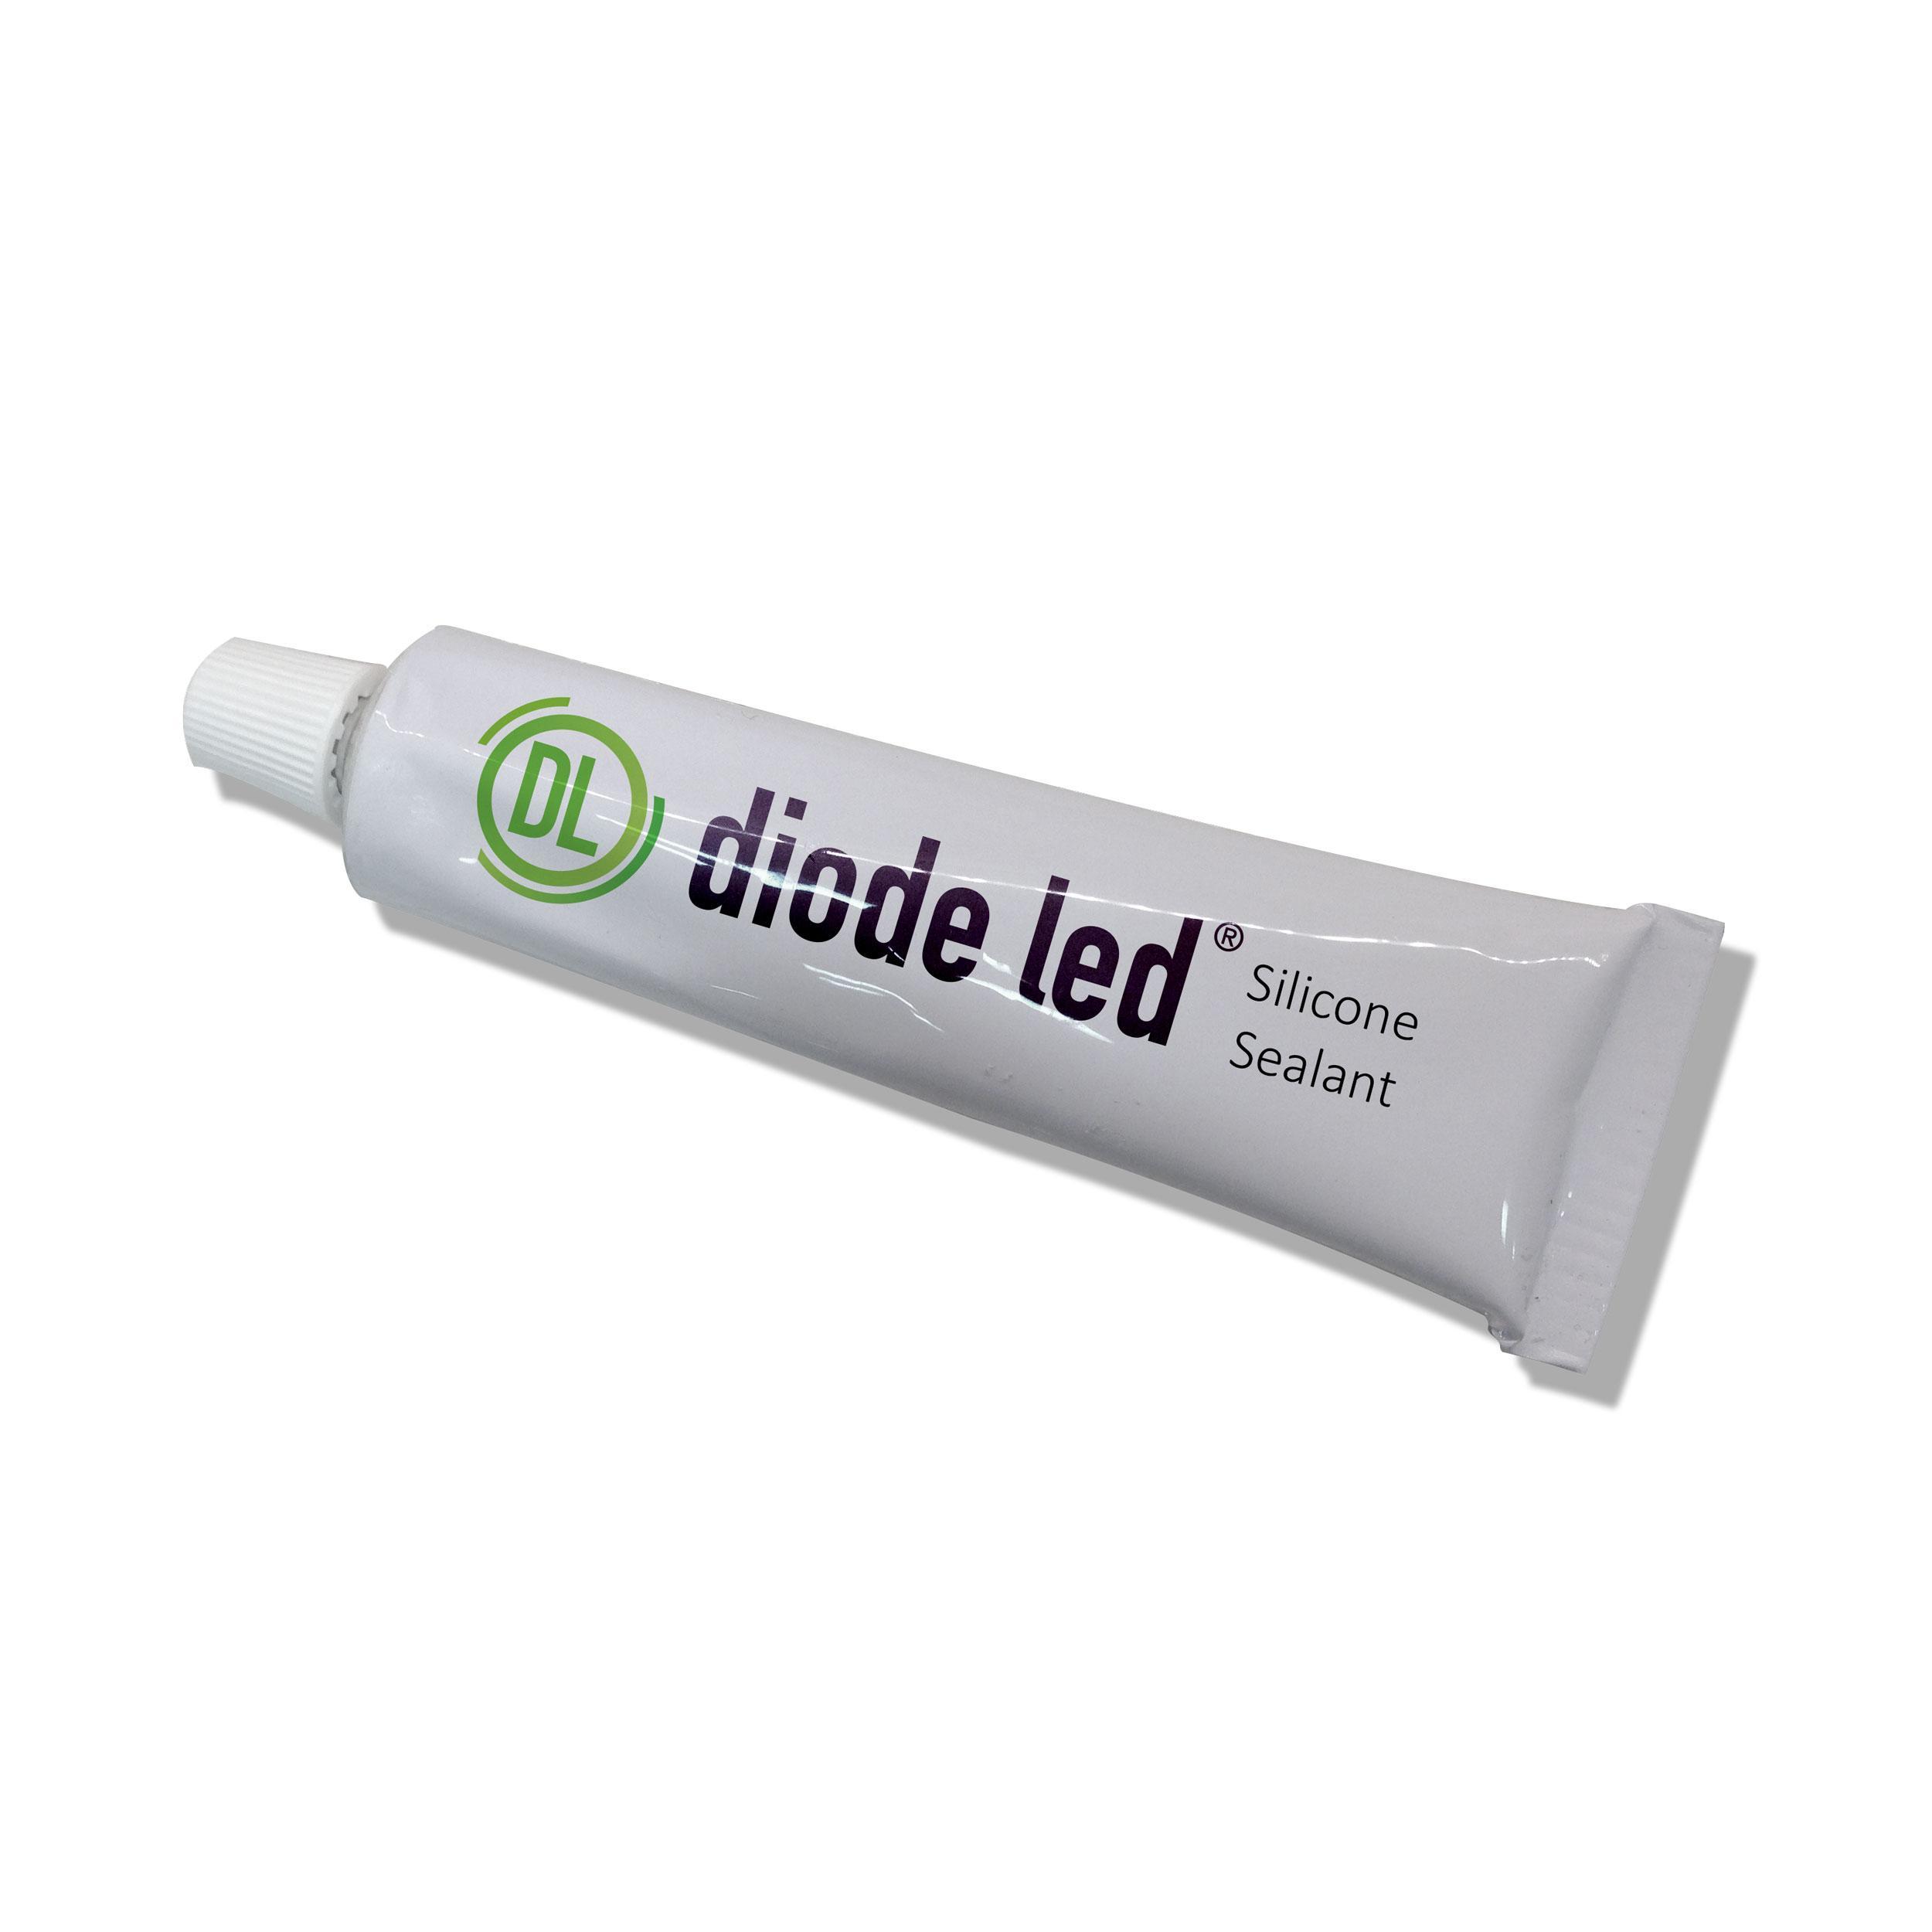 Blaze 12v Wet Location Led Strip: Wet Location LED Accessory